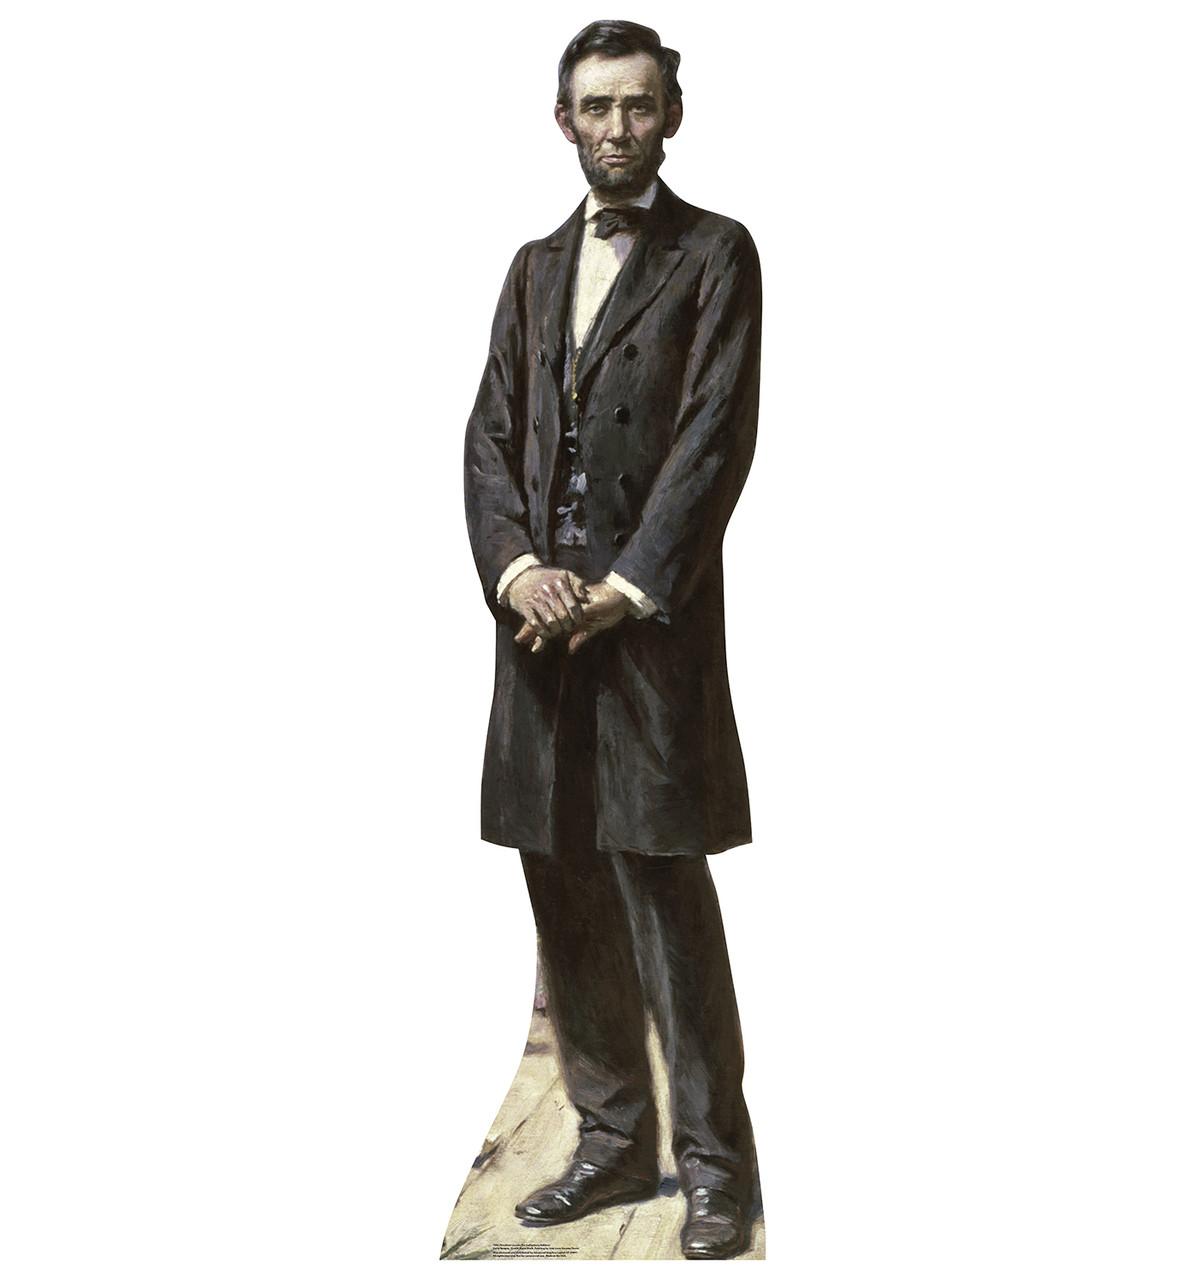 Life Size President Lincoln The Gettysburg Address